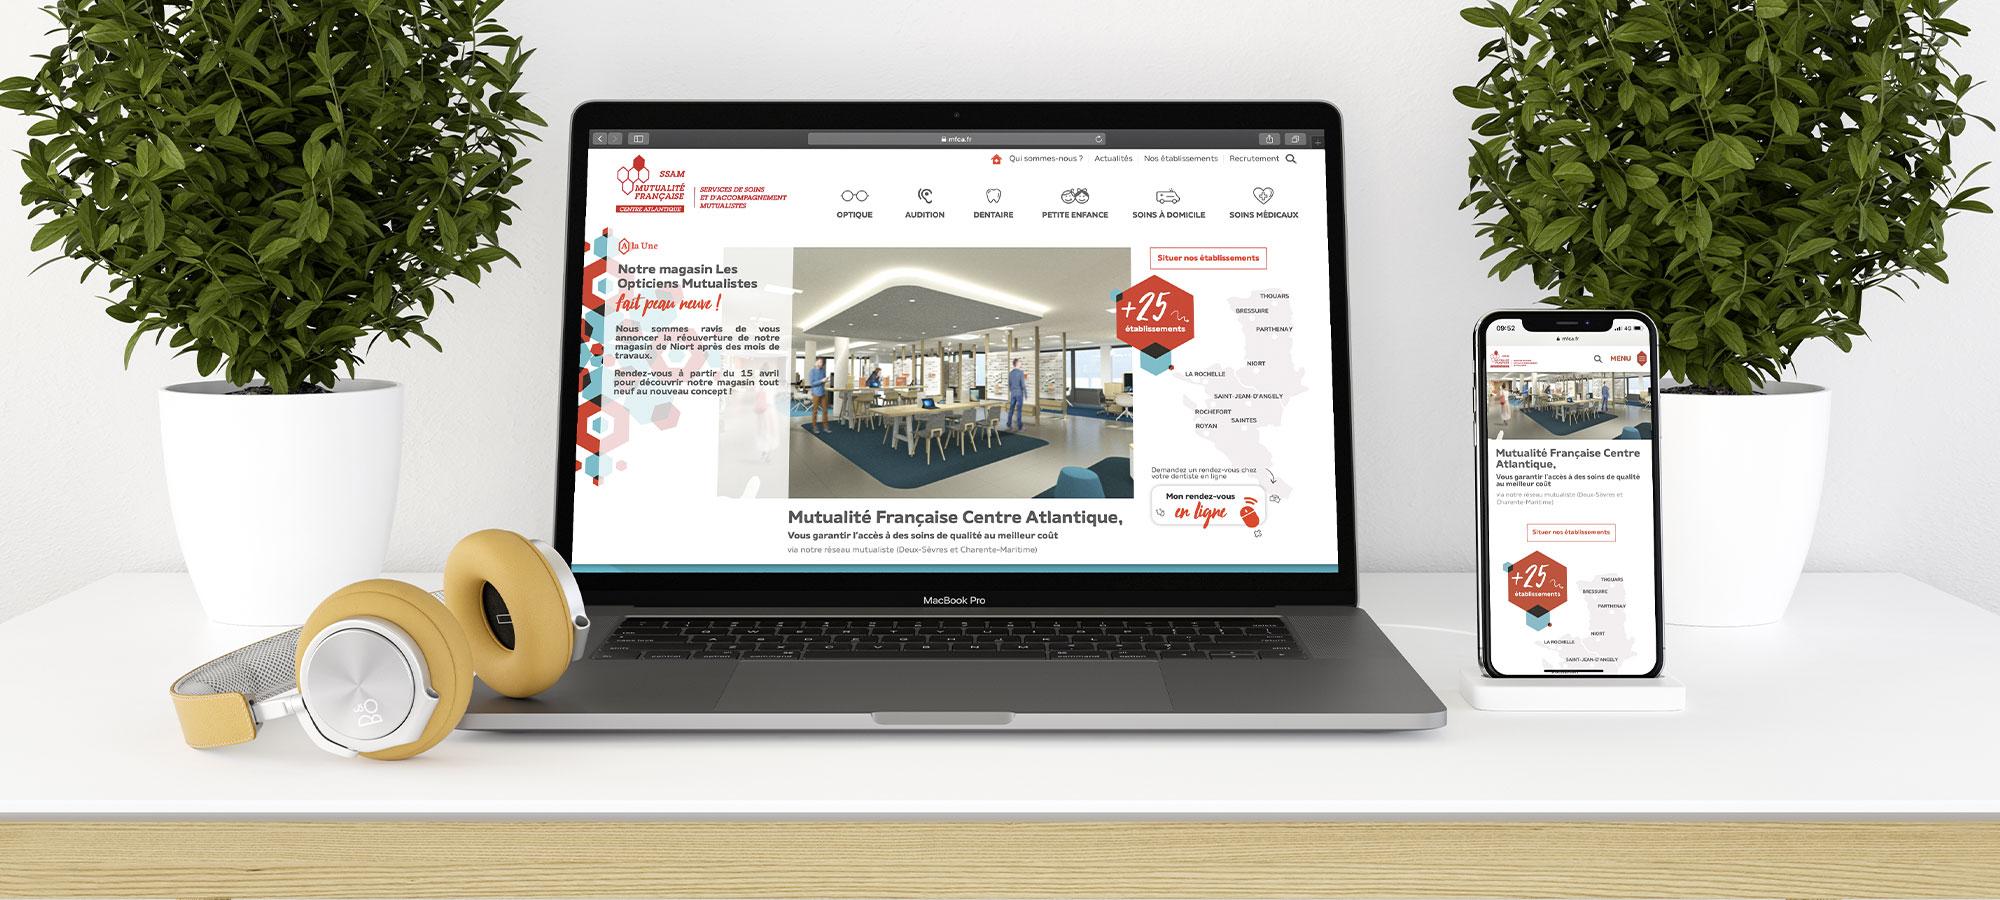 mfca mutualité française site corporate cyberscope